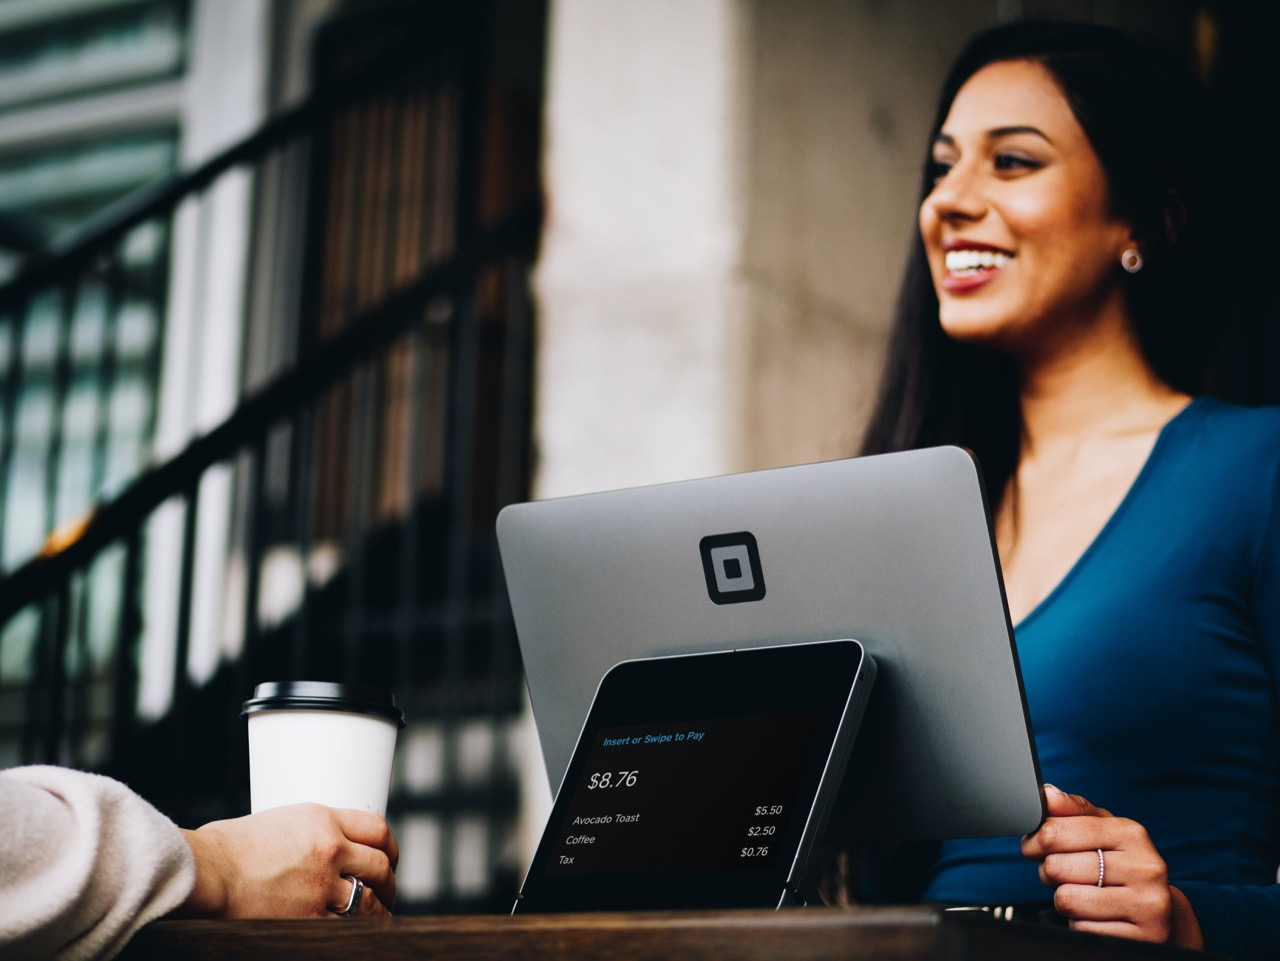 Oki Social is hiring sales associates to work at the Kadena Exchange